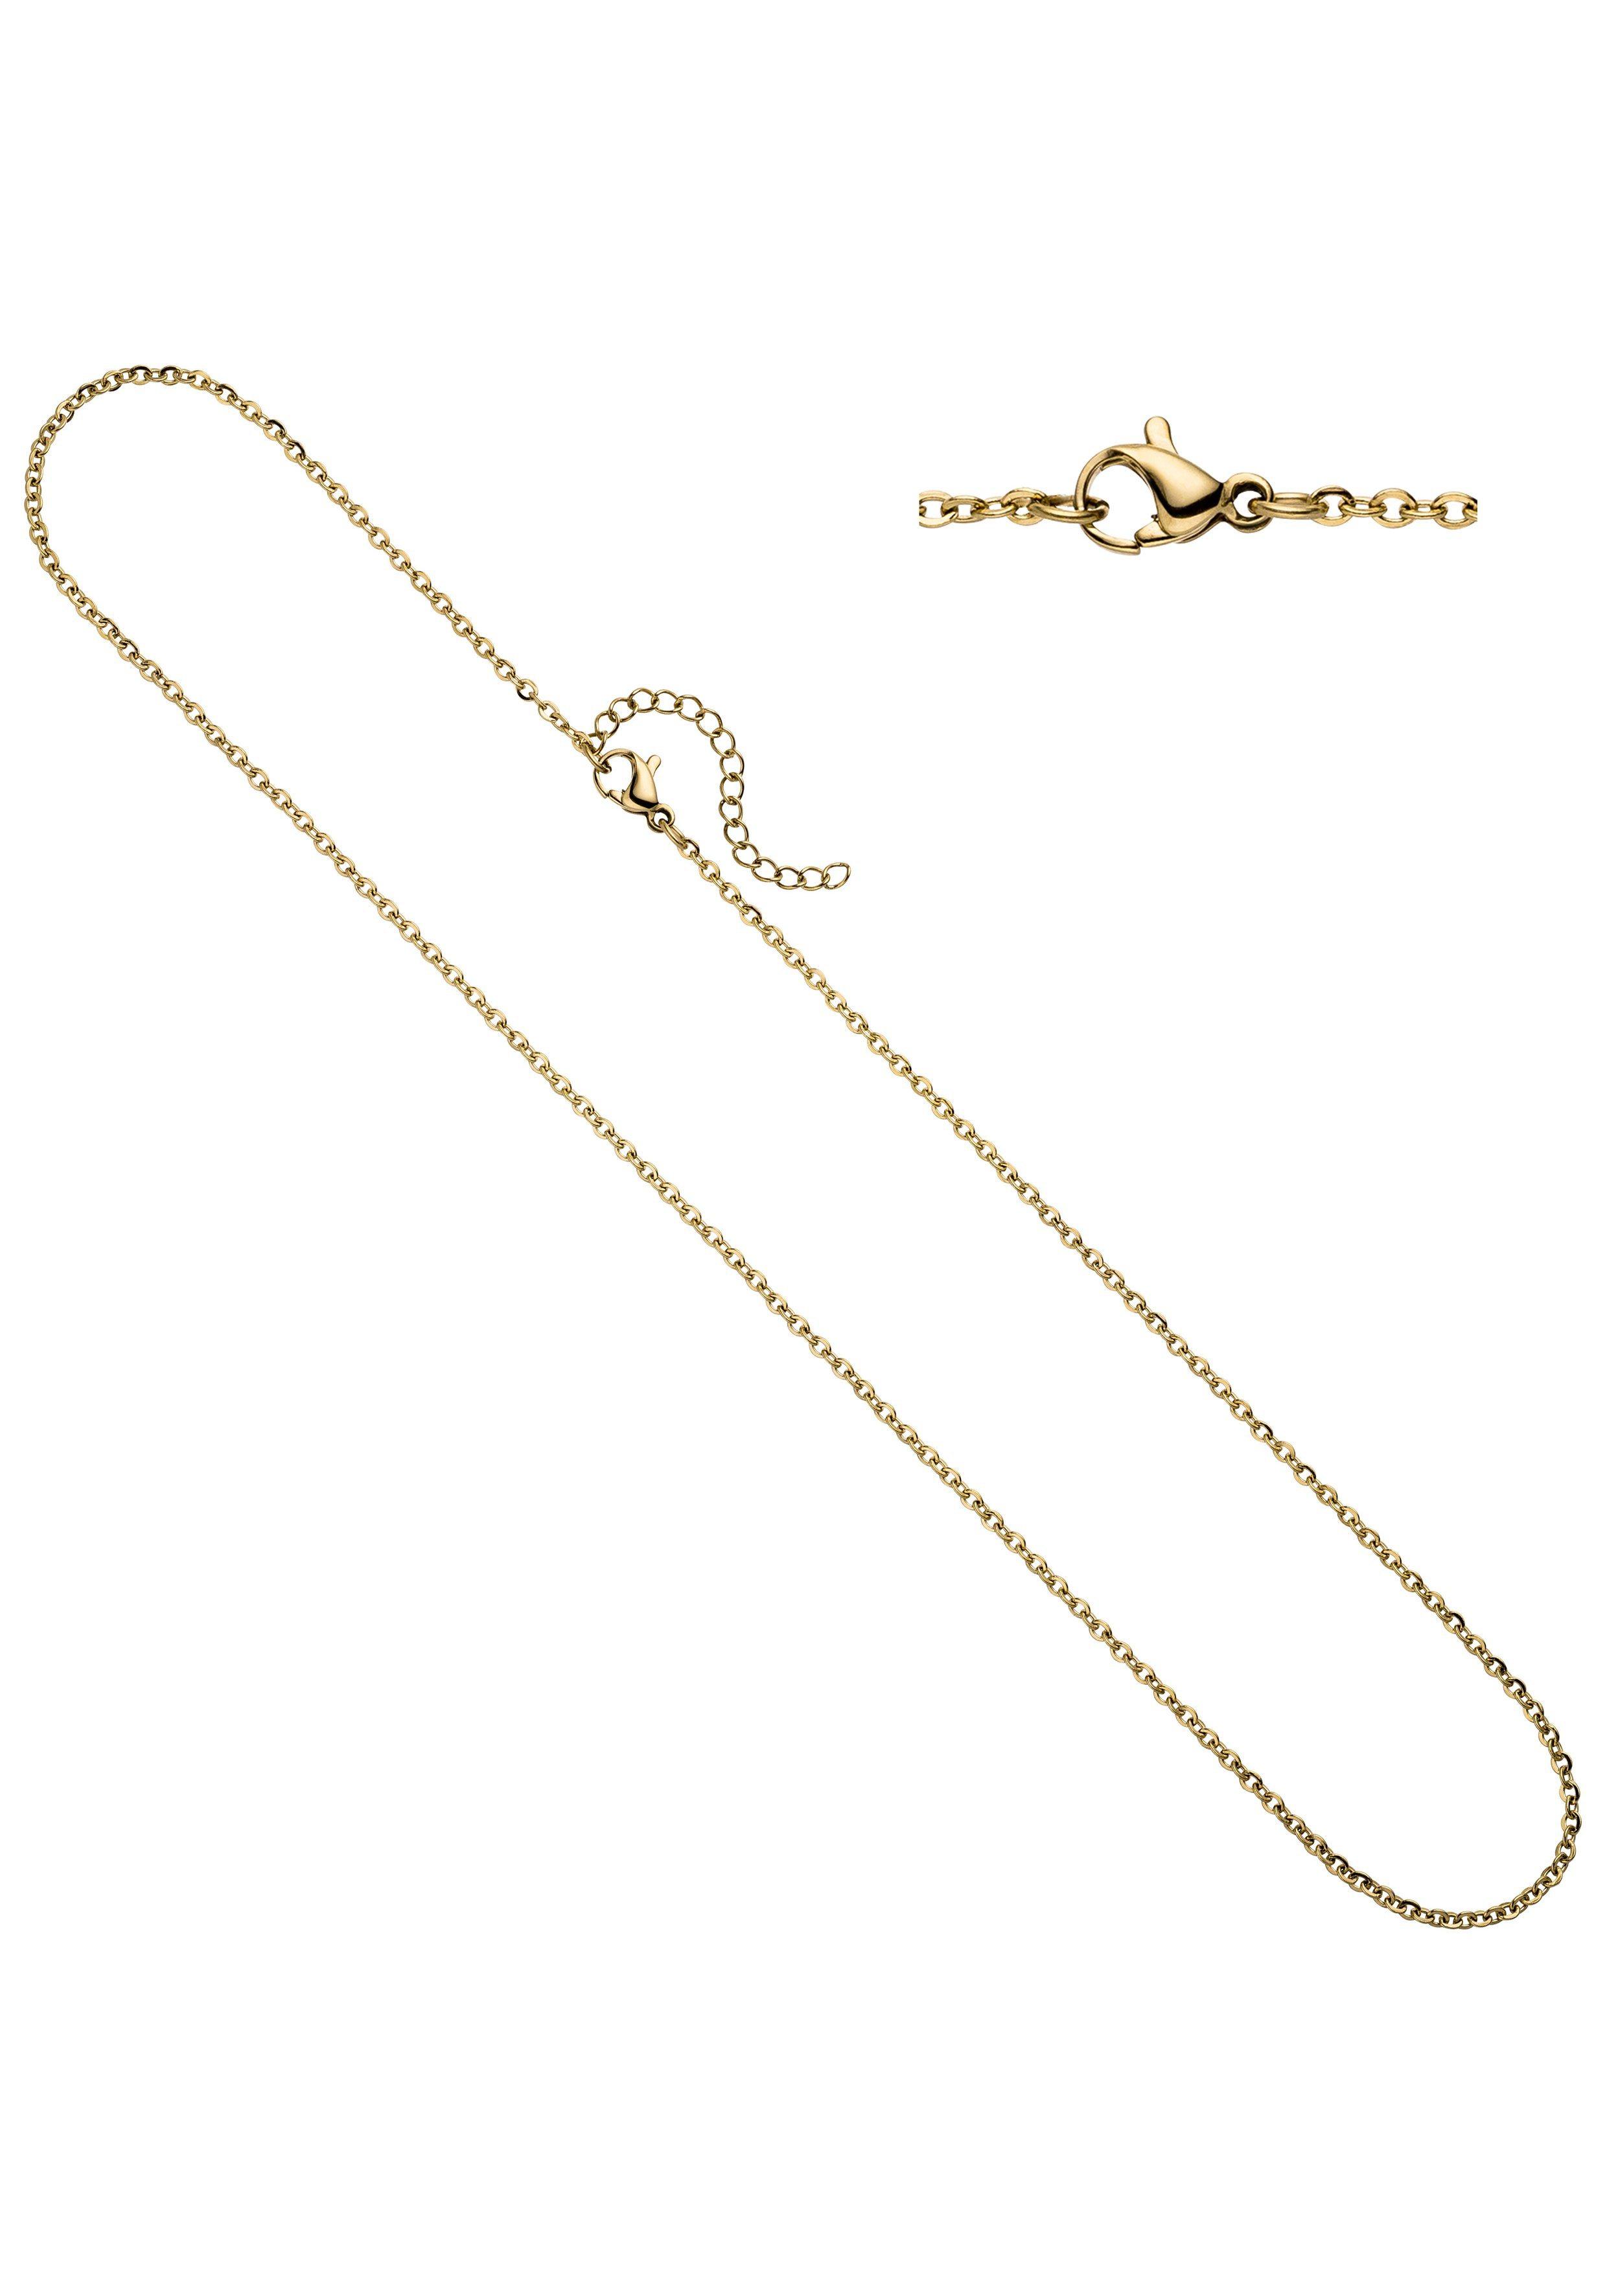 JOBO Kette ohne Anhänger Edelstahl goldfarben 46 cm 47 cm 1,9 mm | Schmuck > Halsketten > Ketten ohne Anhänger | Goldfarben | JOBO